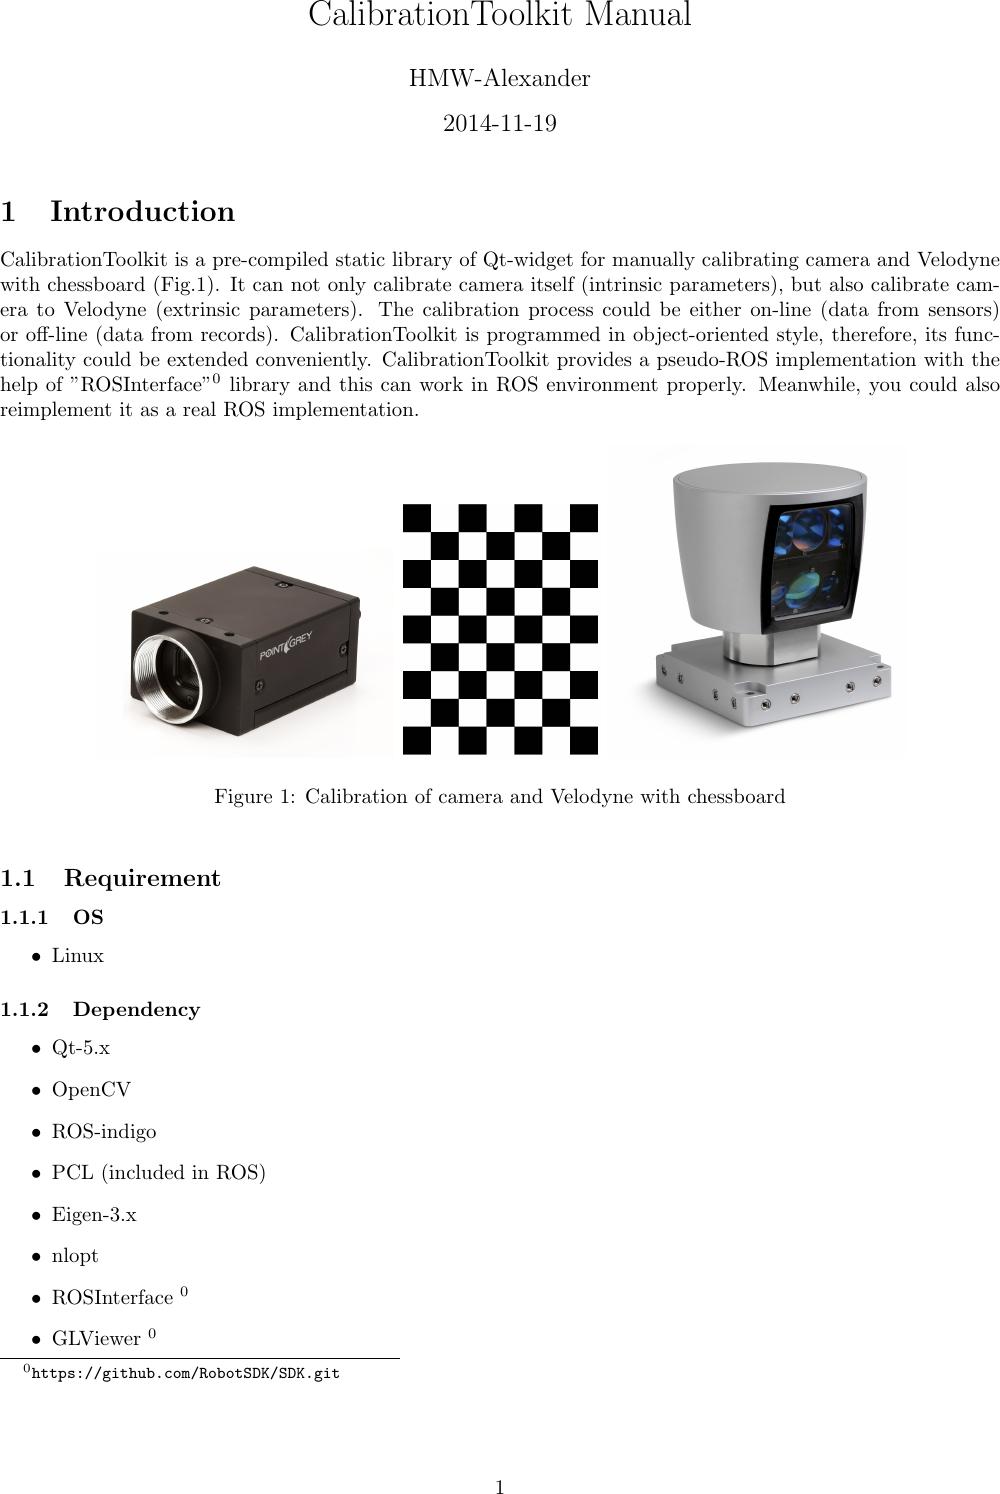 Calibration Toolkit Manual